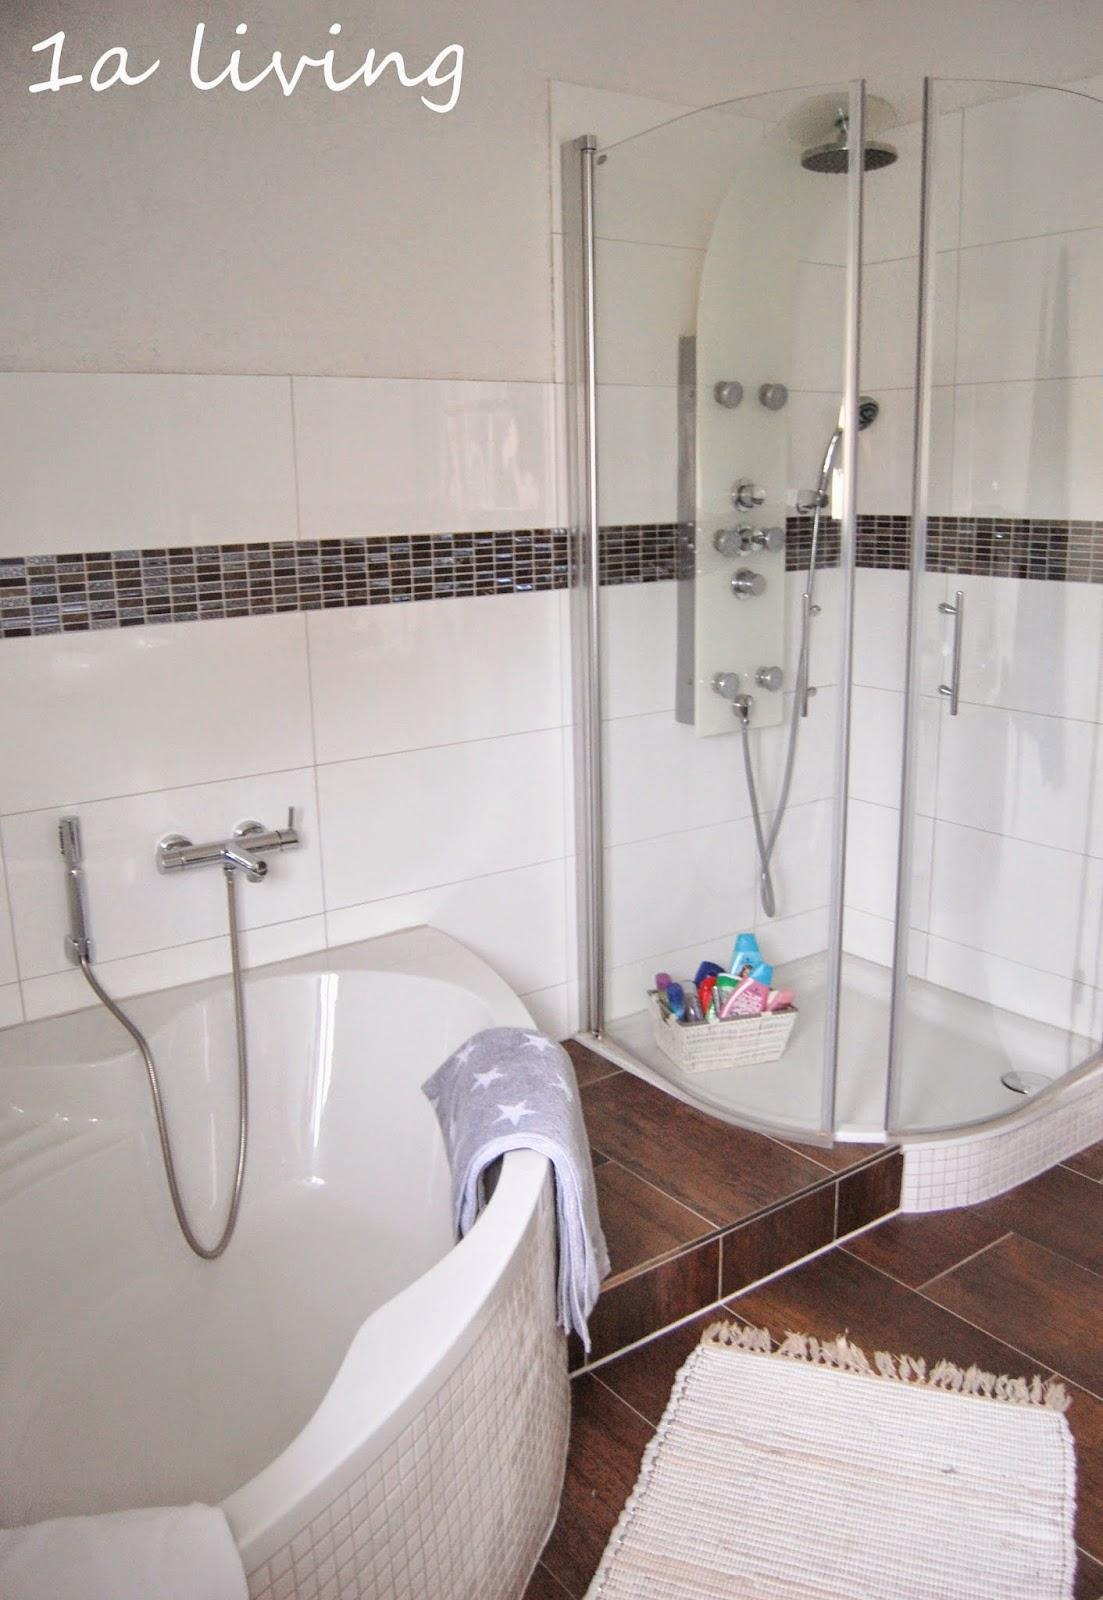 1a living die andere seite vom bad ein blick ins g ste wc. Black Bedroom Furniture Sets. Home Design Ideas